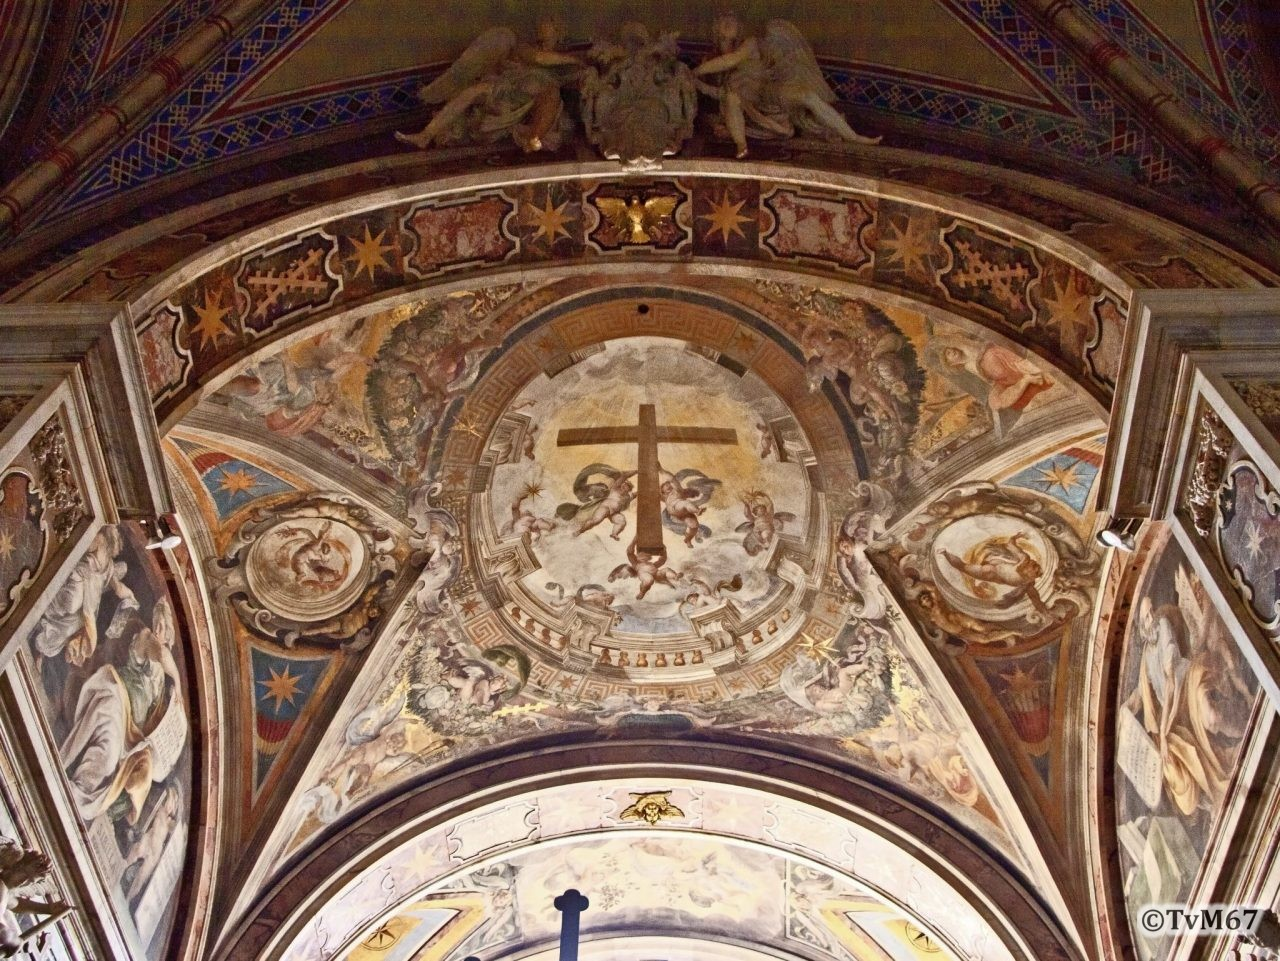 Roma, Chiesa di Santa Maria sopra Minerva, 6e k re, Cap Aldobraindini, Alberti, gewelf